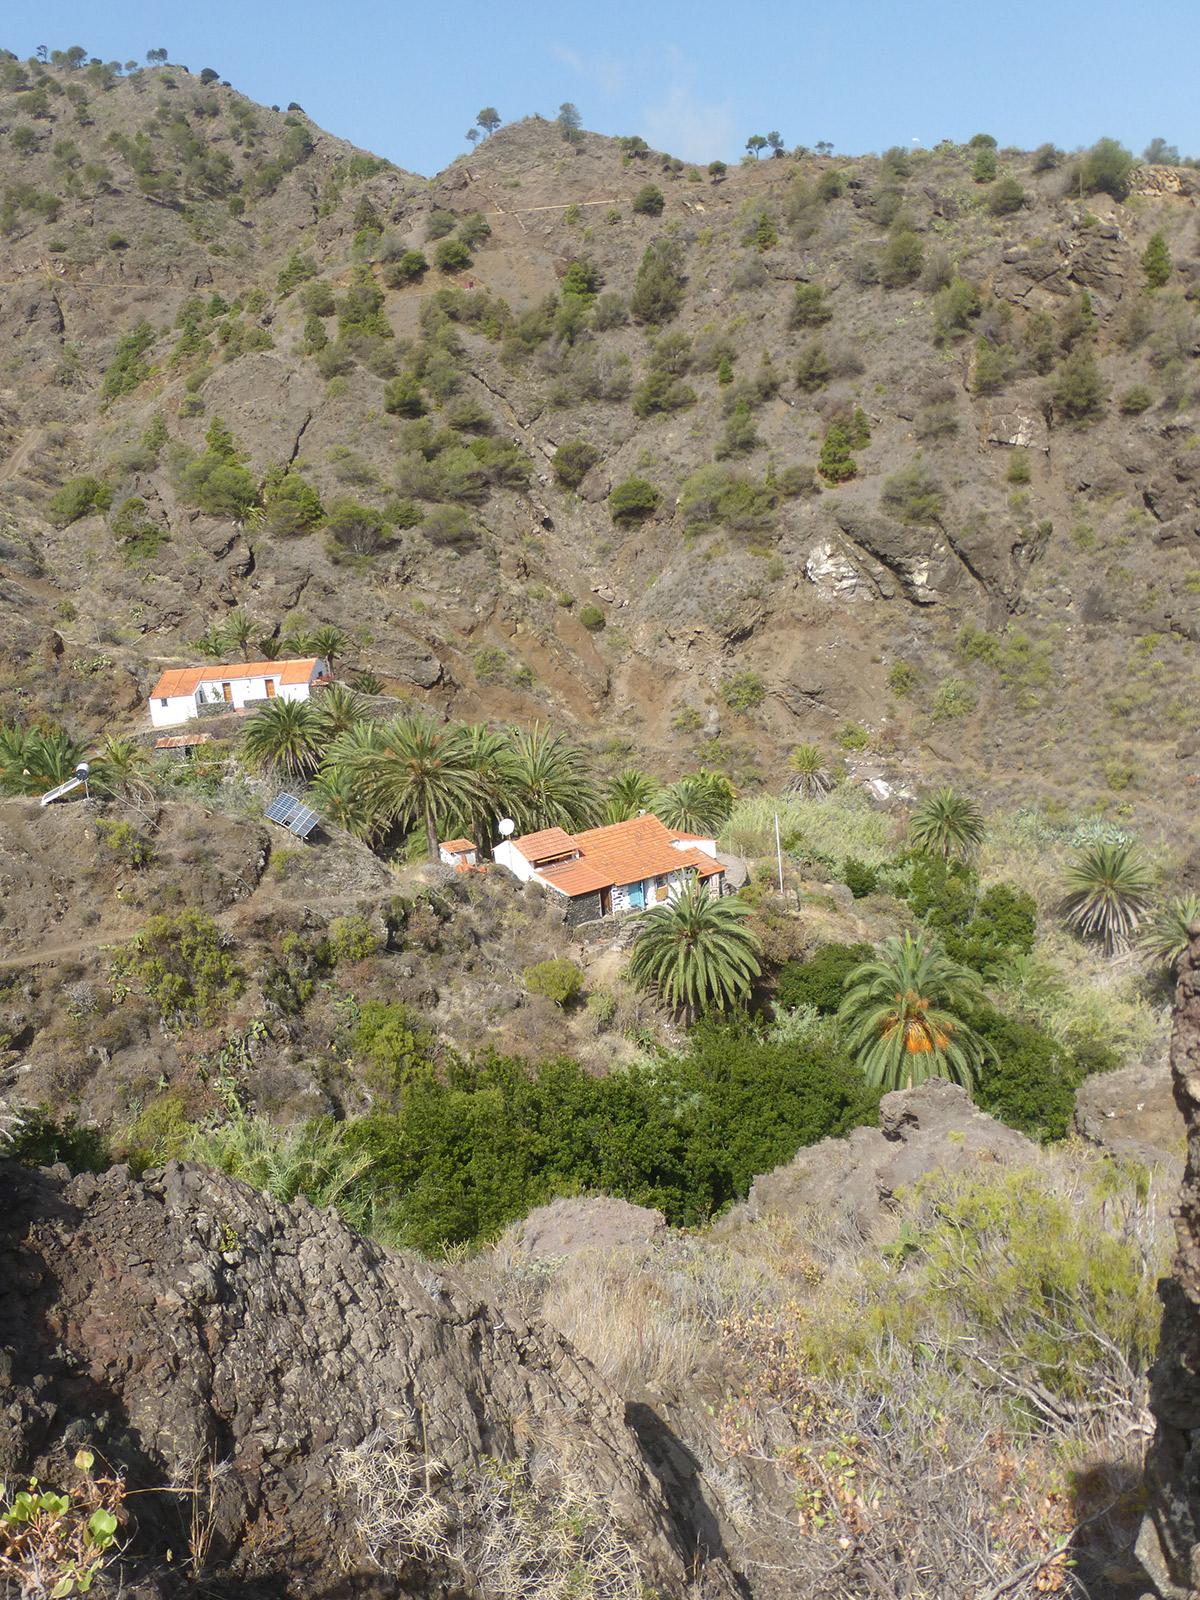 Wanderung um Hermigua, Haus bei Moralito